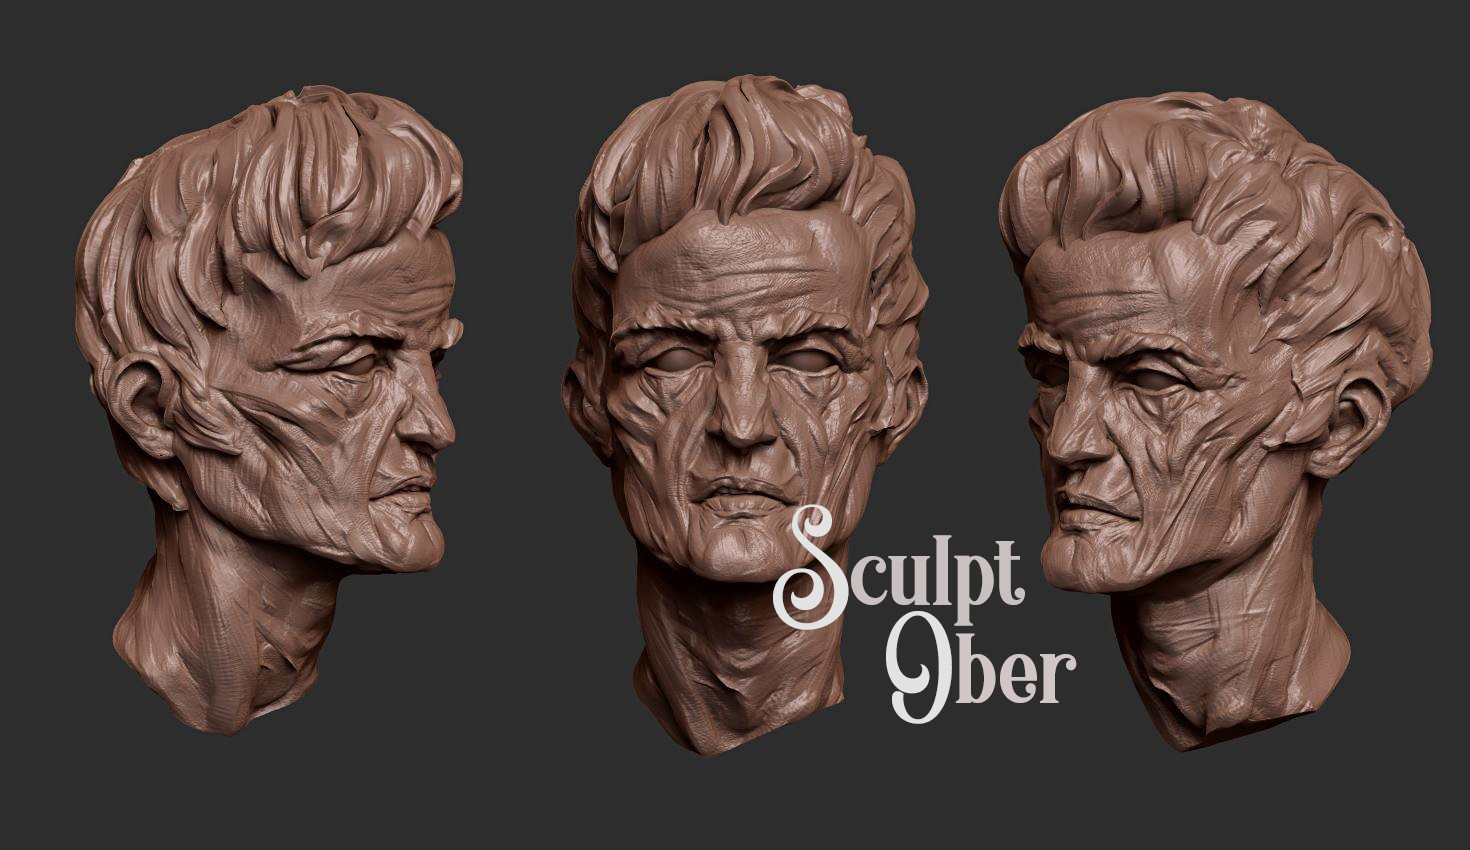 Sculpt October 2018 lunch break time EPISODE 3